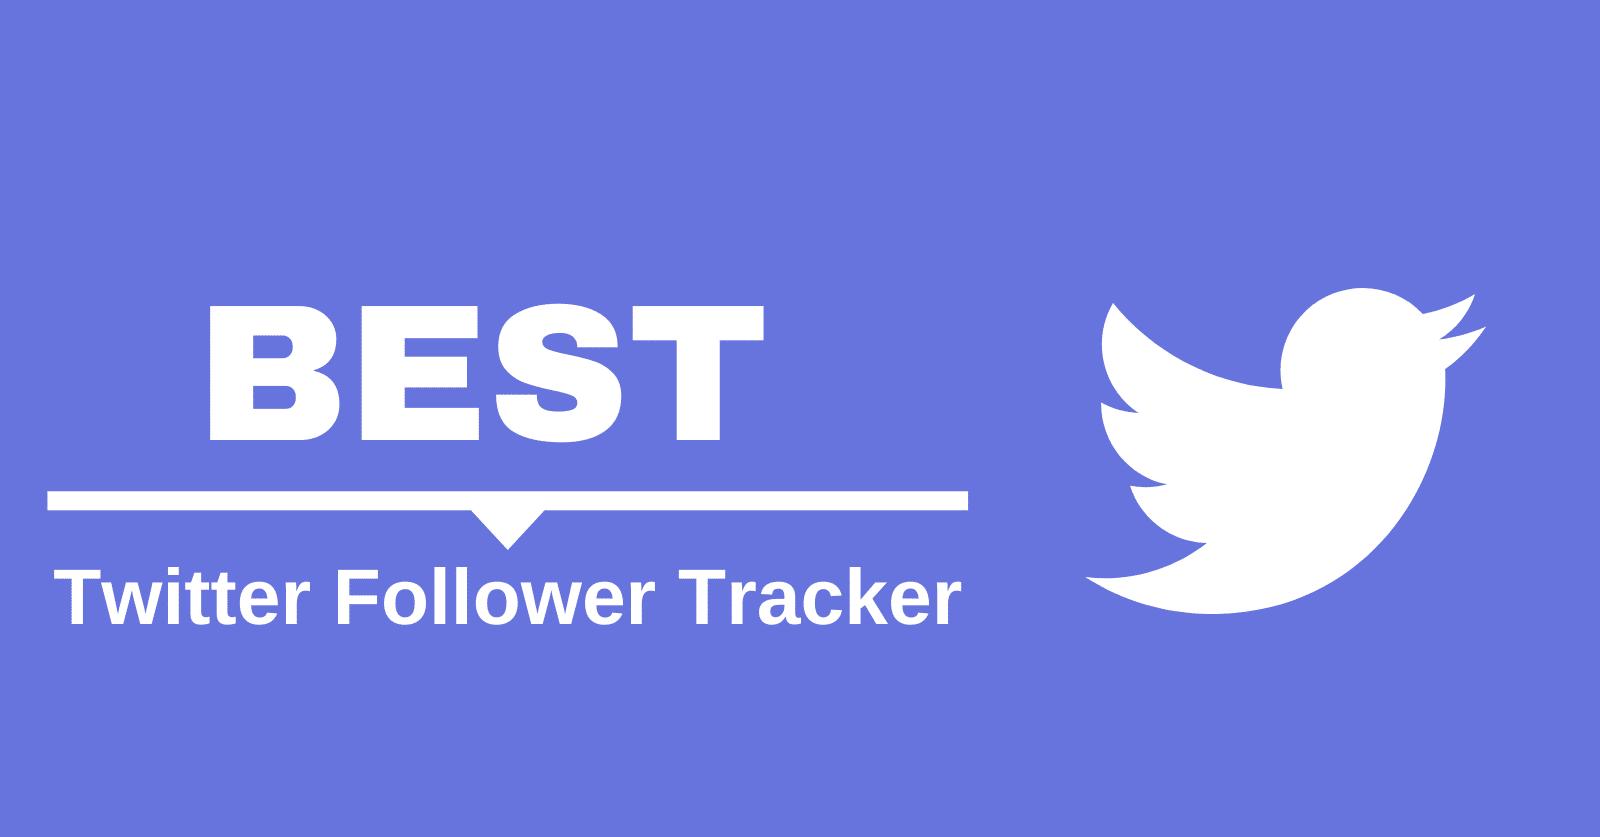 Best Twitter Follower Tracker